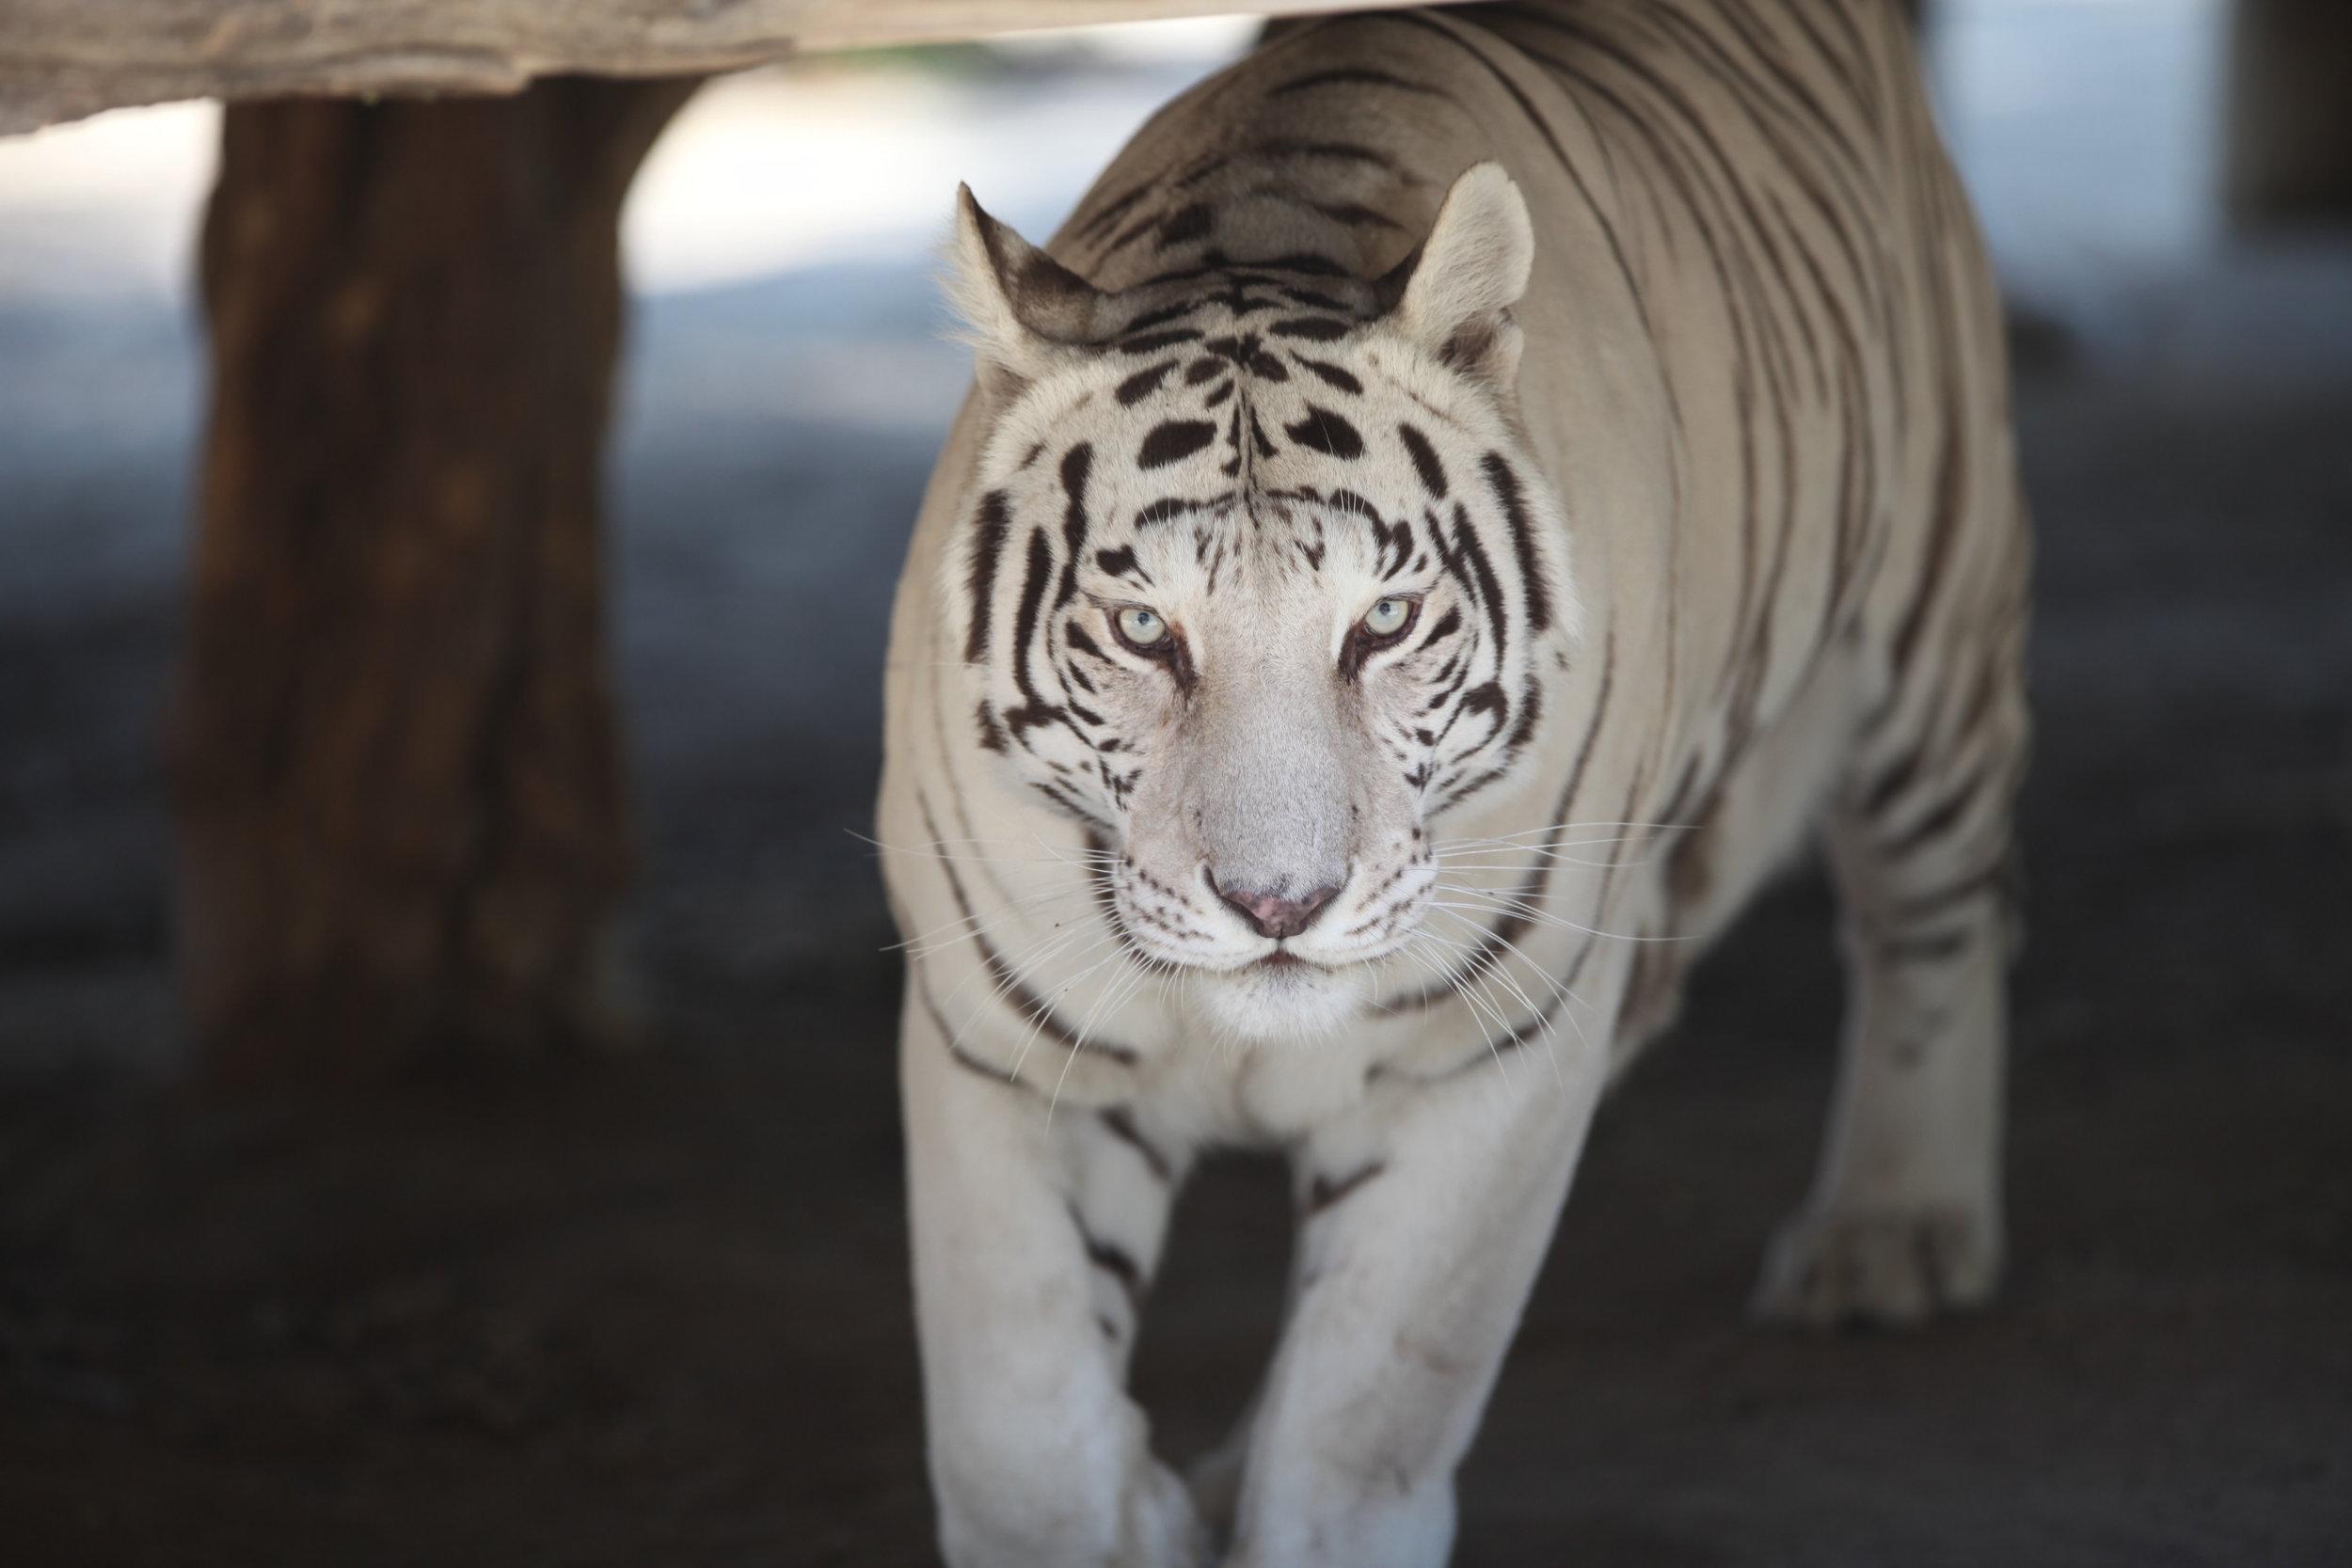 tigers_2_20170915_1078798025-view=image&format=raw&type=orig&id=190.jpg